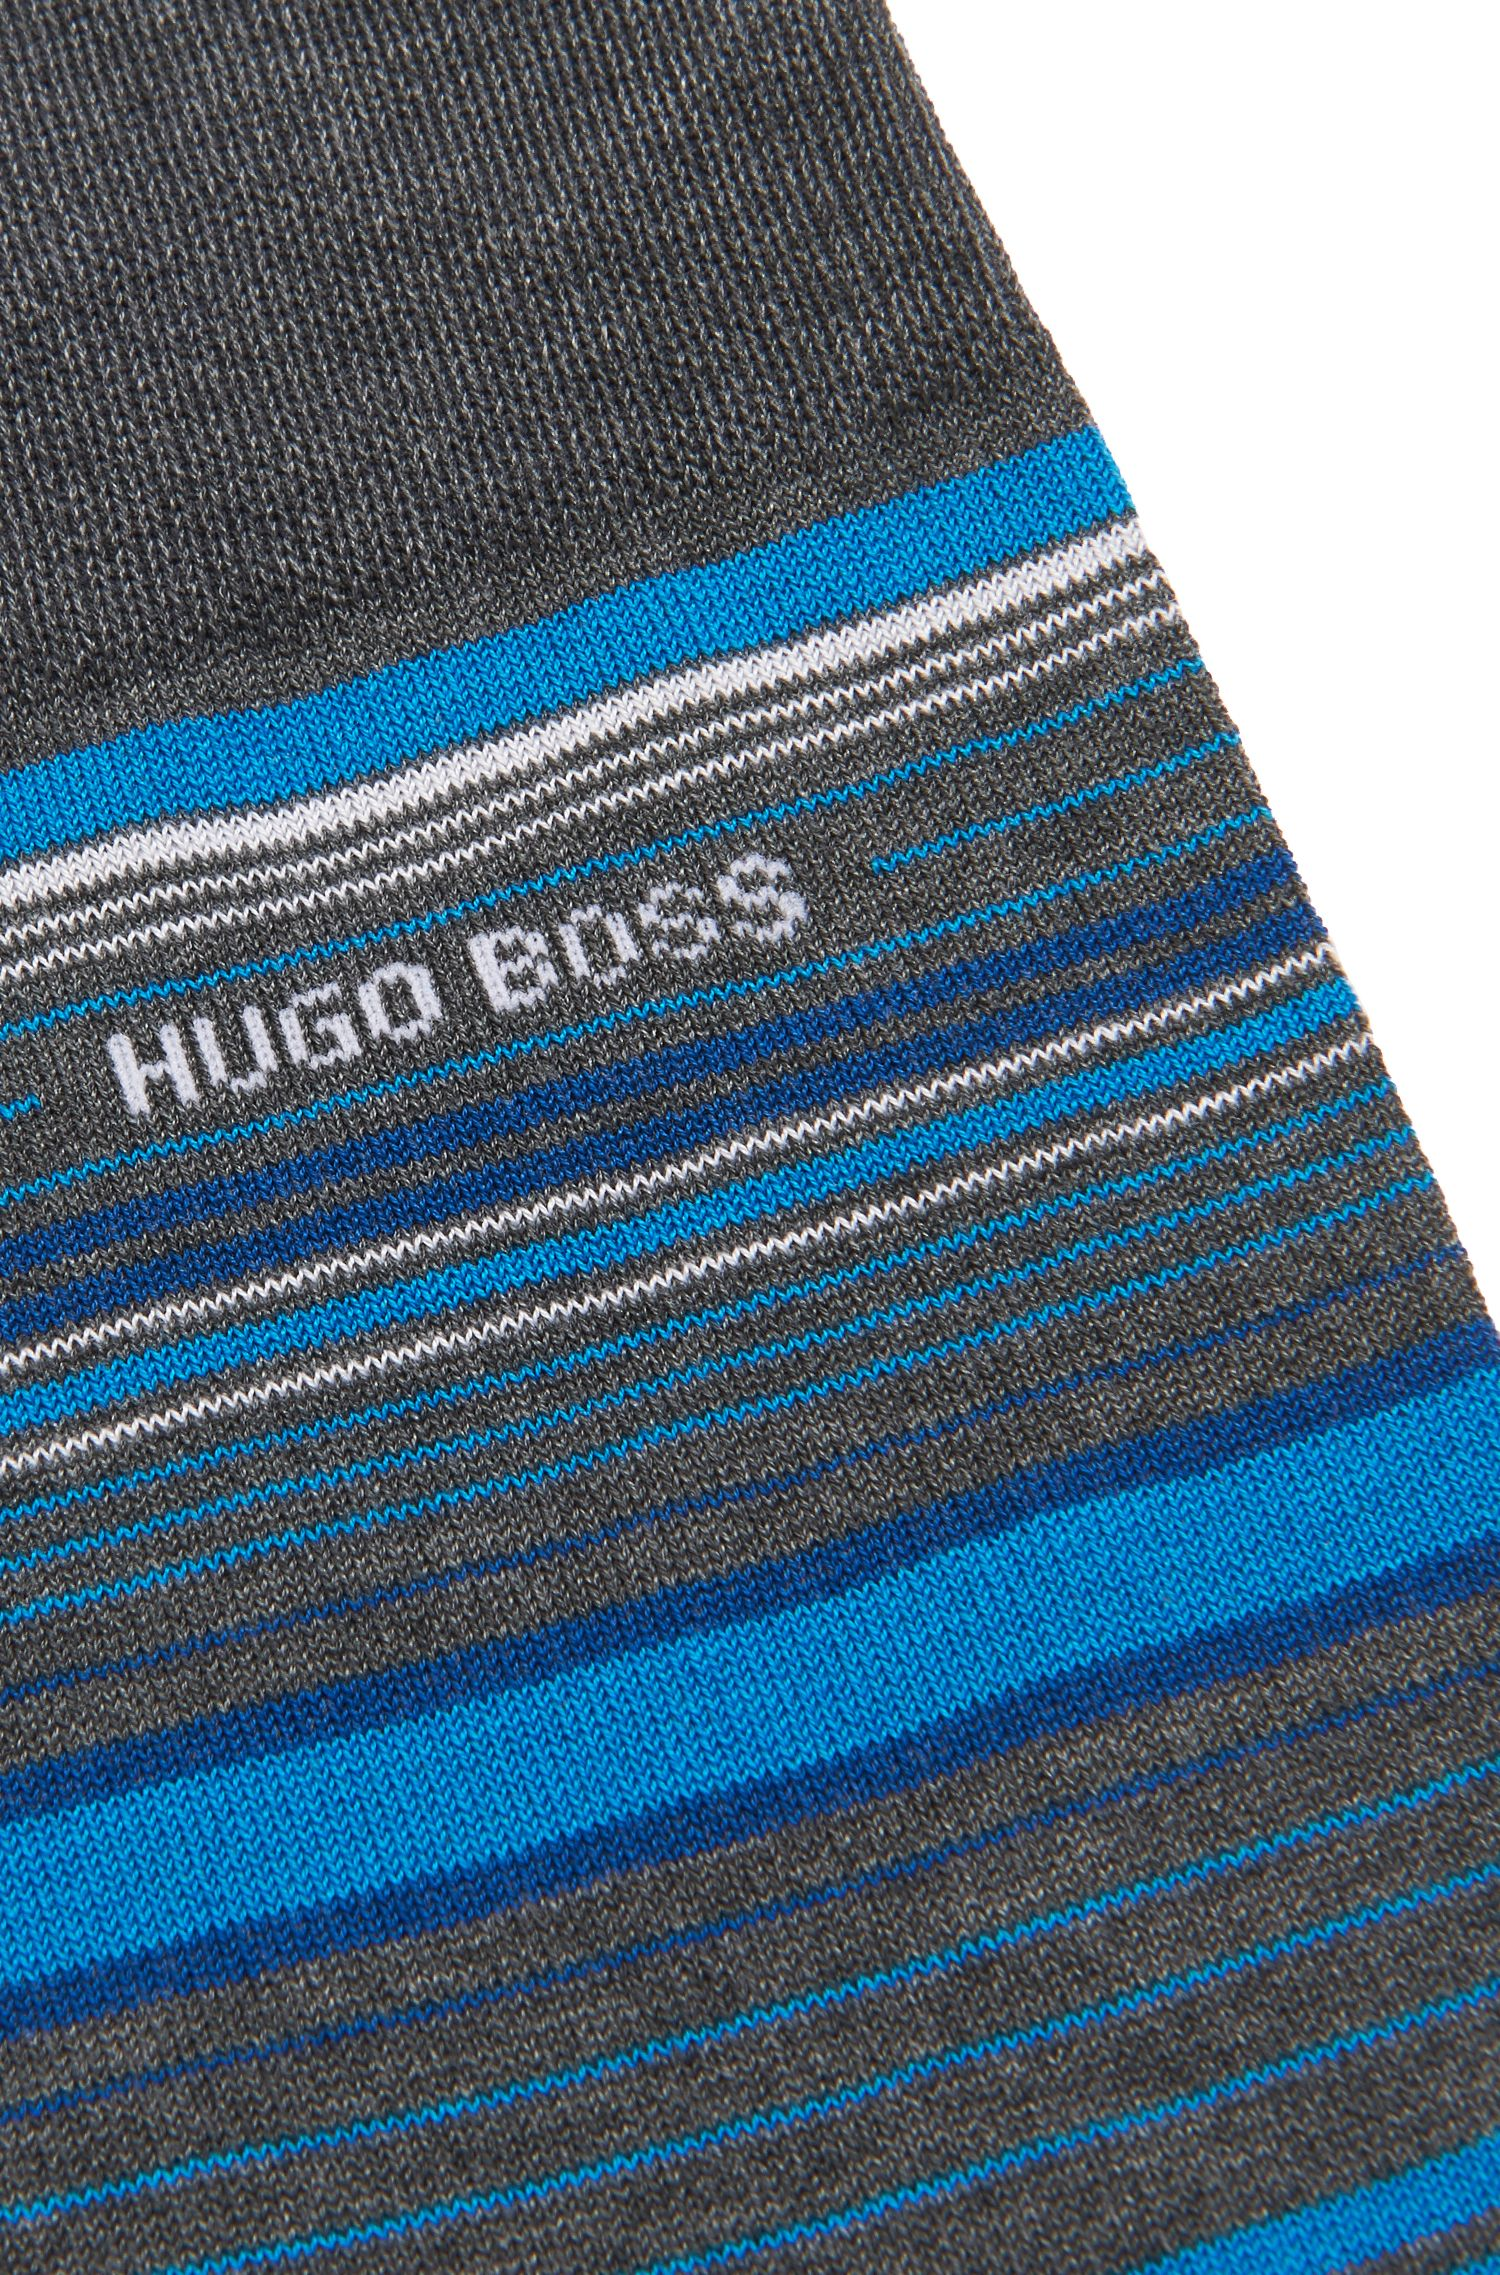 Striped socks in a mercerised cotton blend, Grey